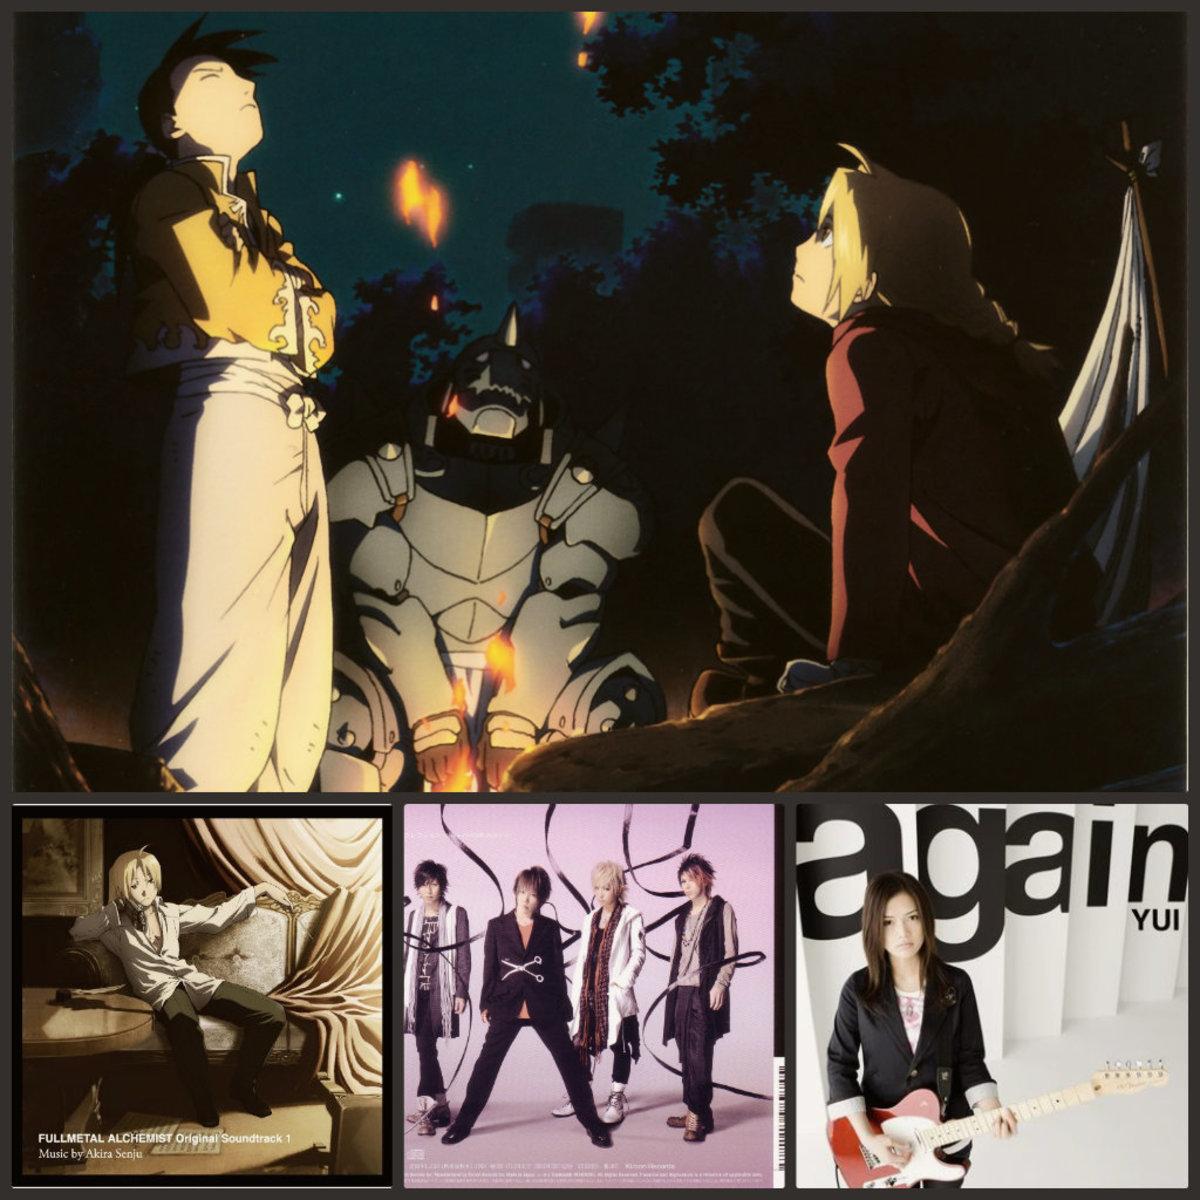 Fullmetal Alchemist Intro Lyrics: Top Anime Soundtracks (OSTs): Anime Series With The Best